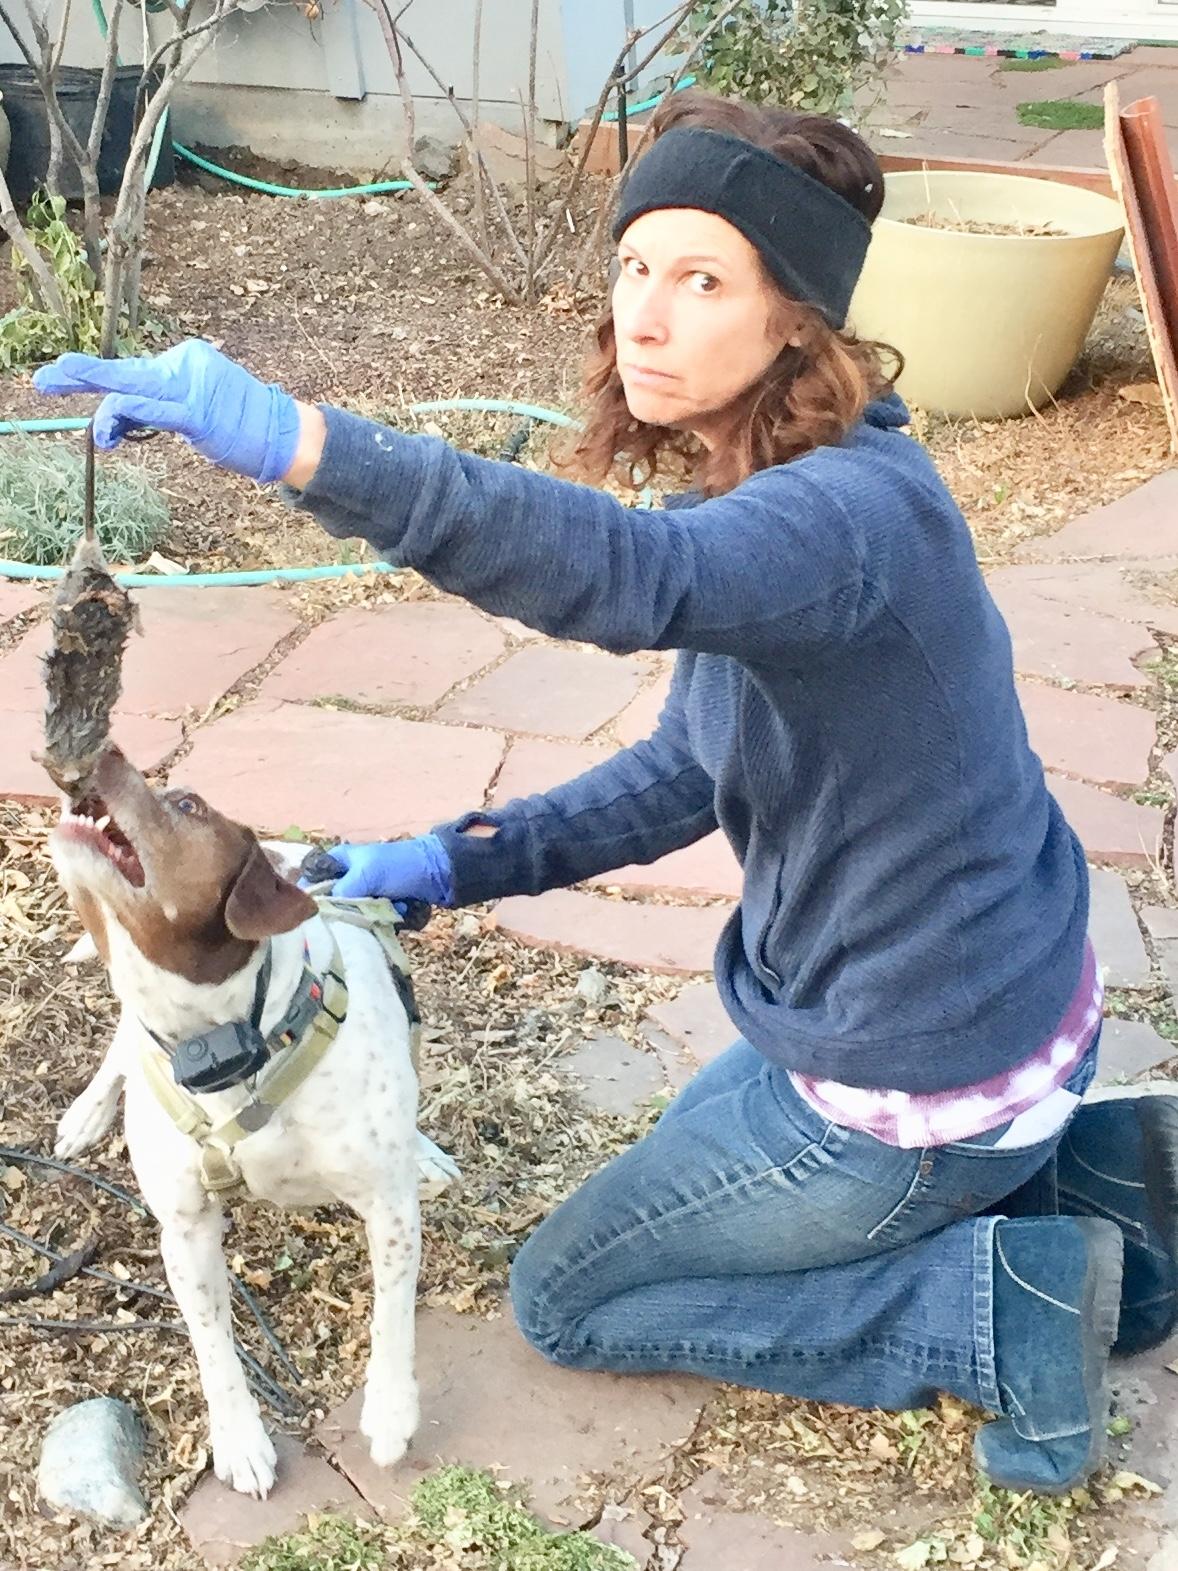 Ellen and her pup Jane got a rat.